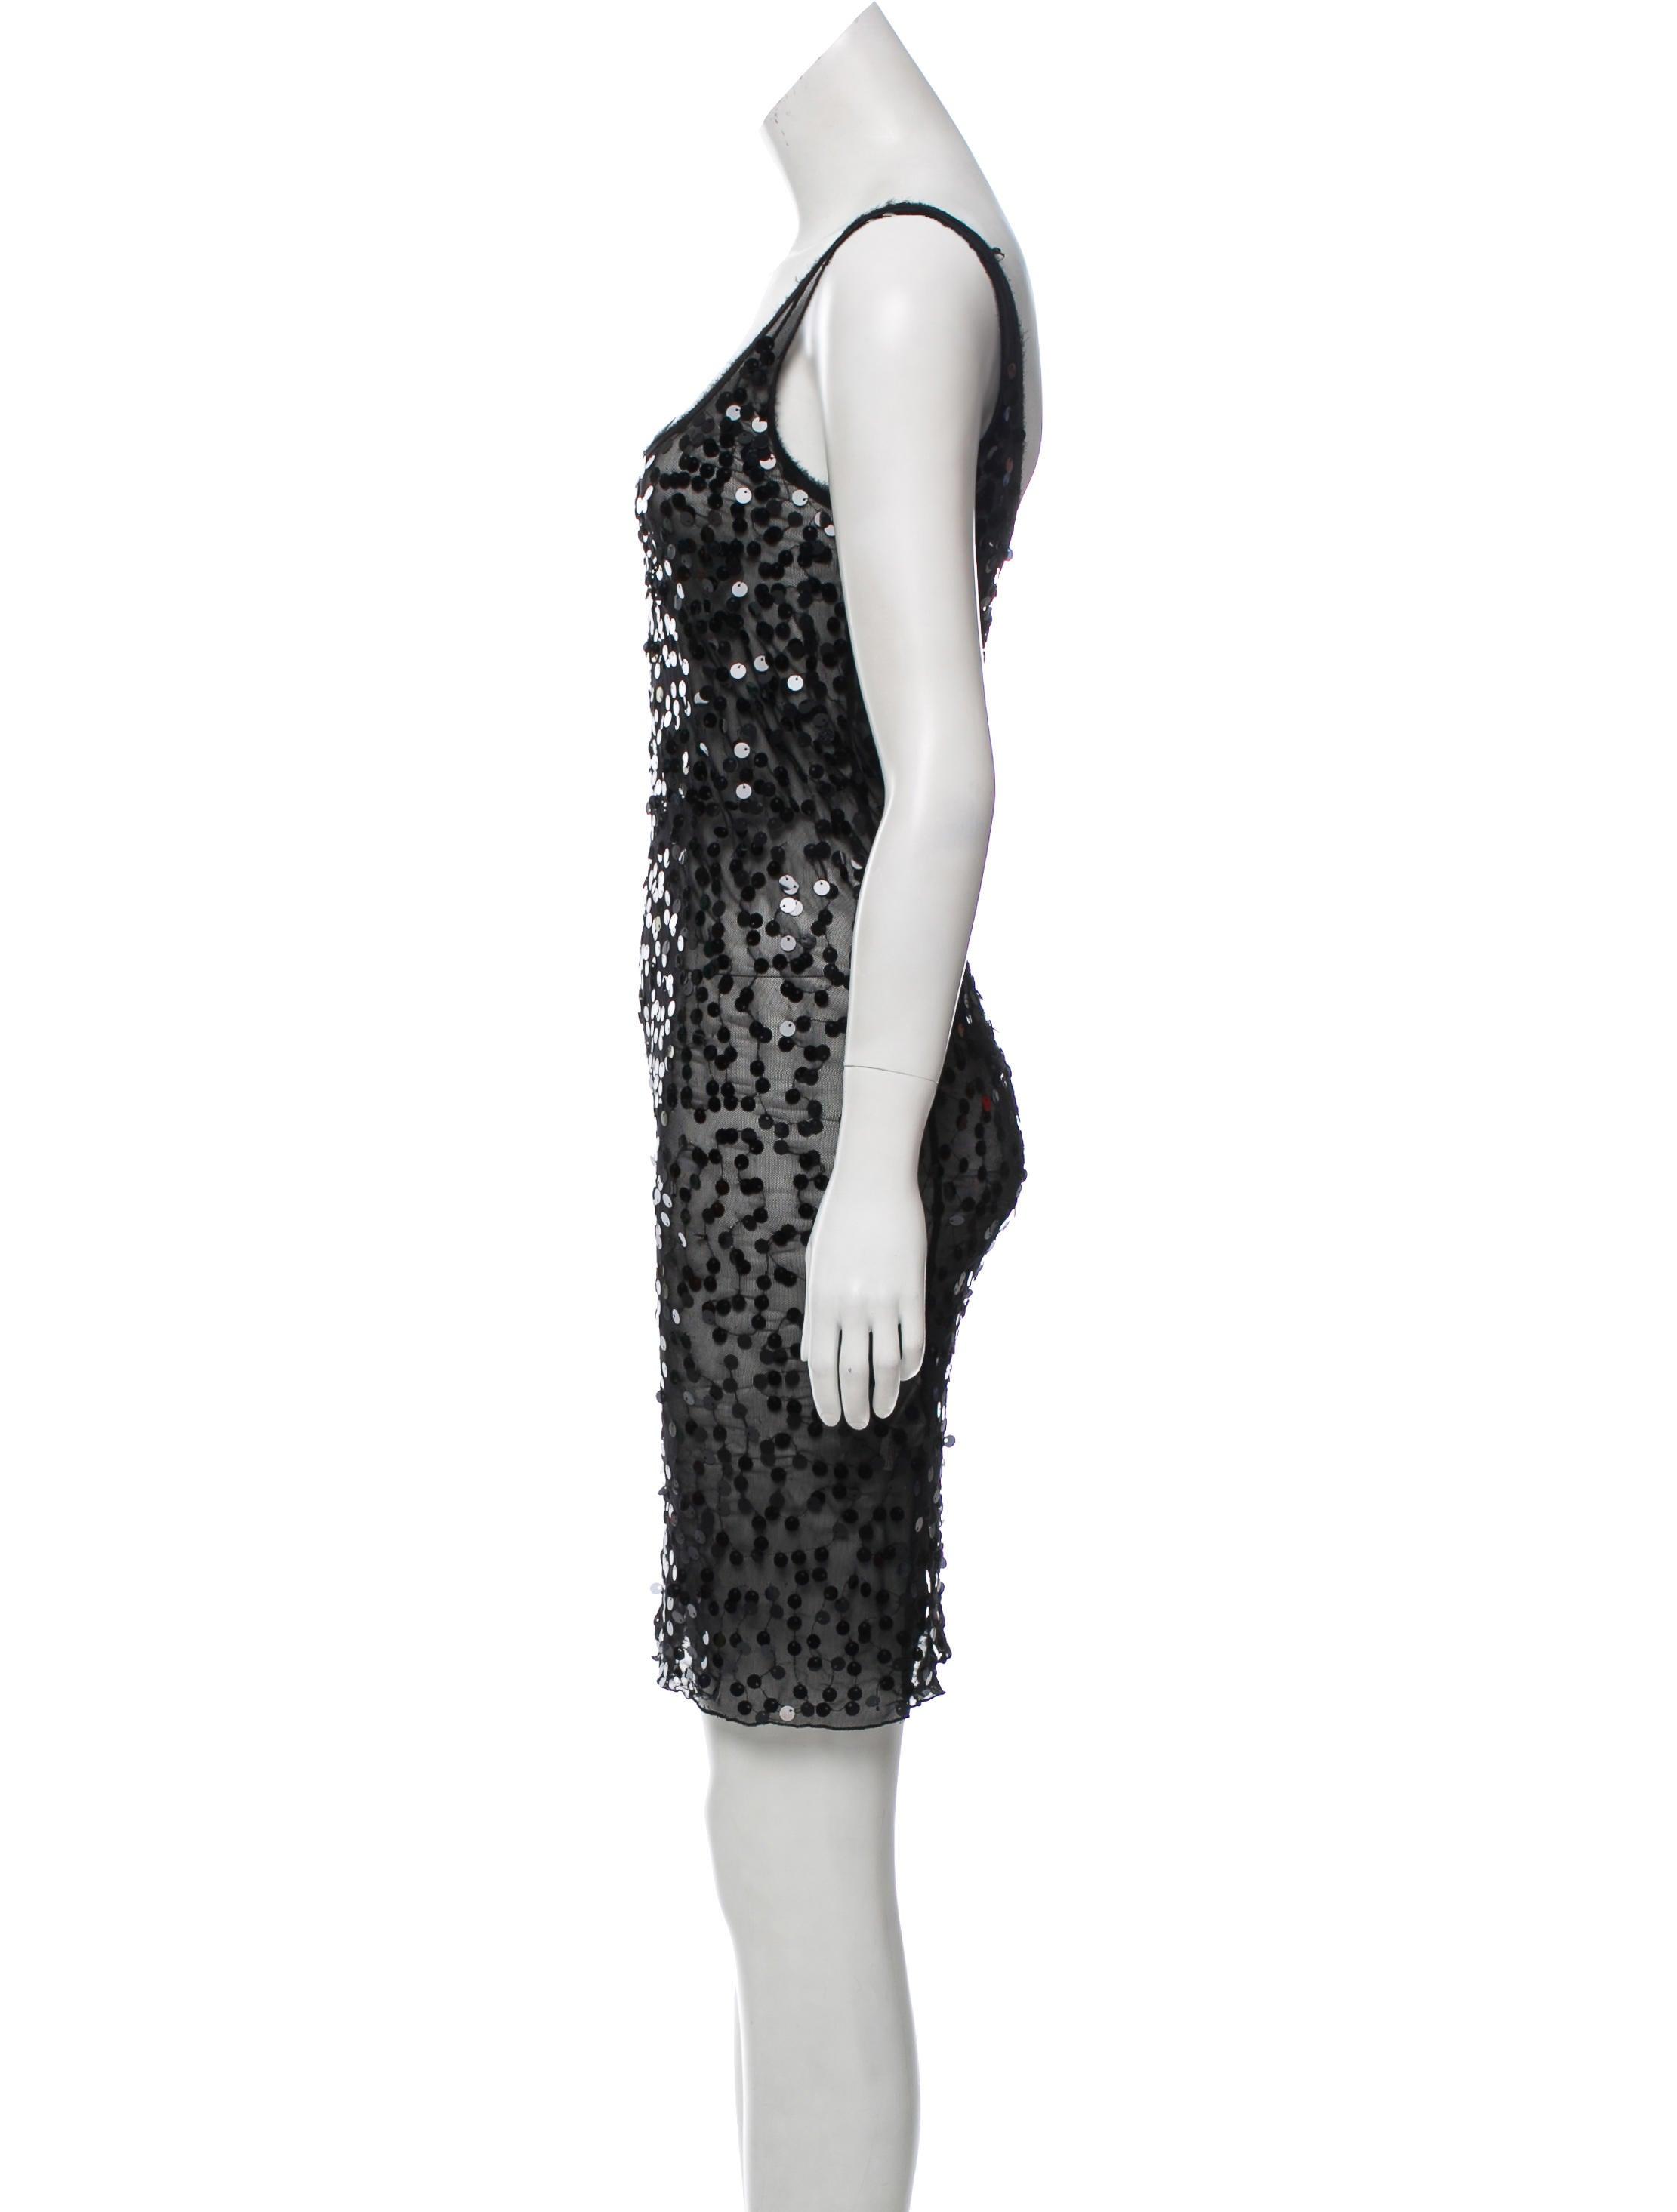 2a788da3fc8 By Malene Birger Embellished Mini Dress - Clothing - WMB24372 | The ...